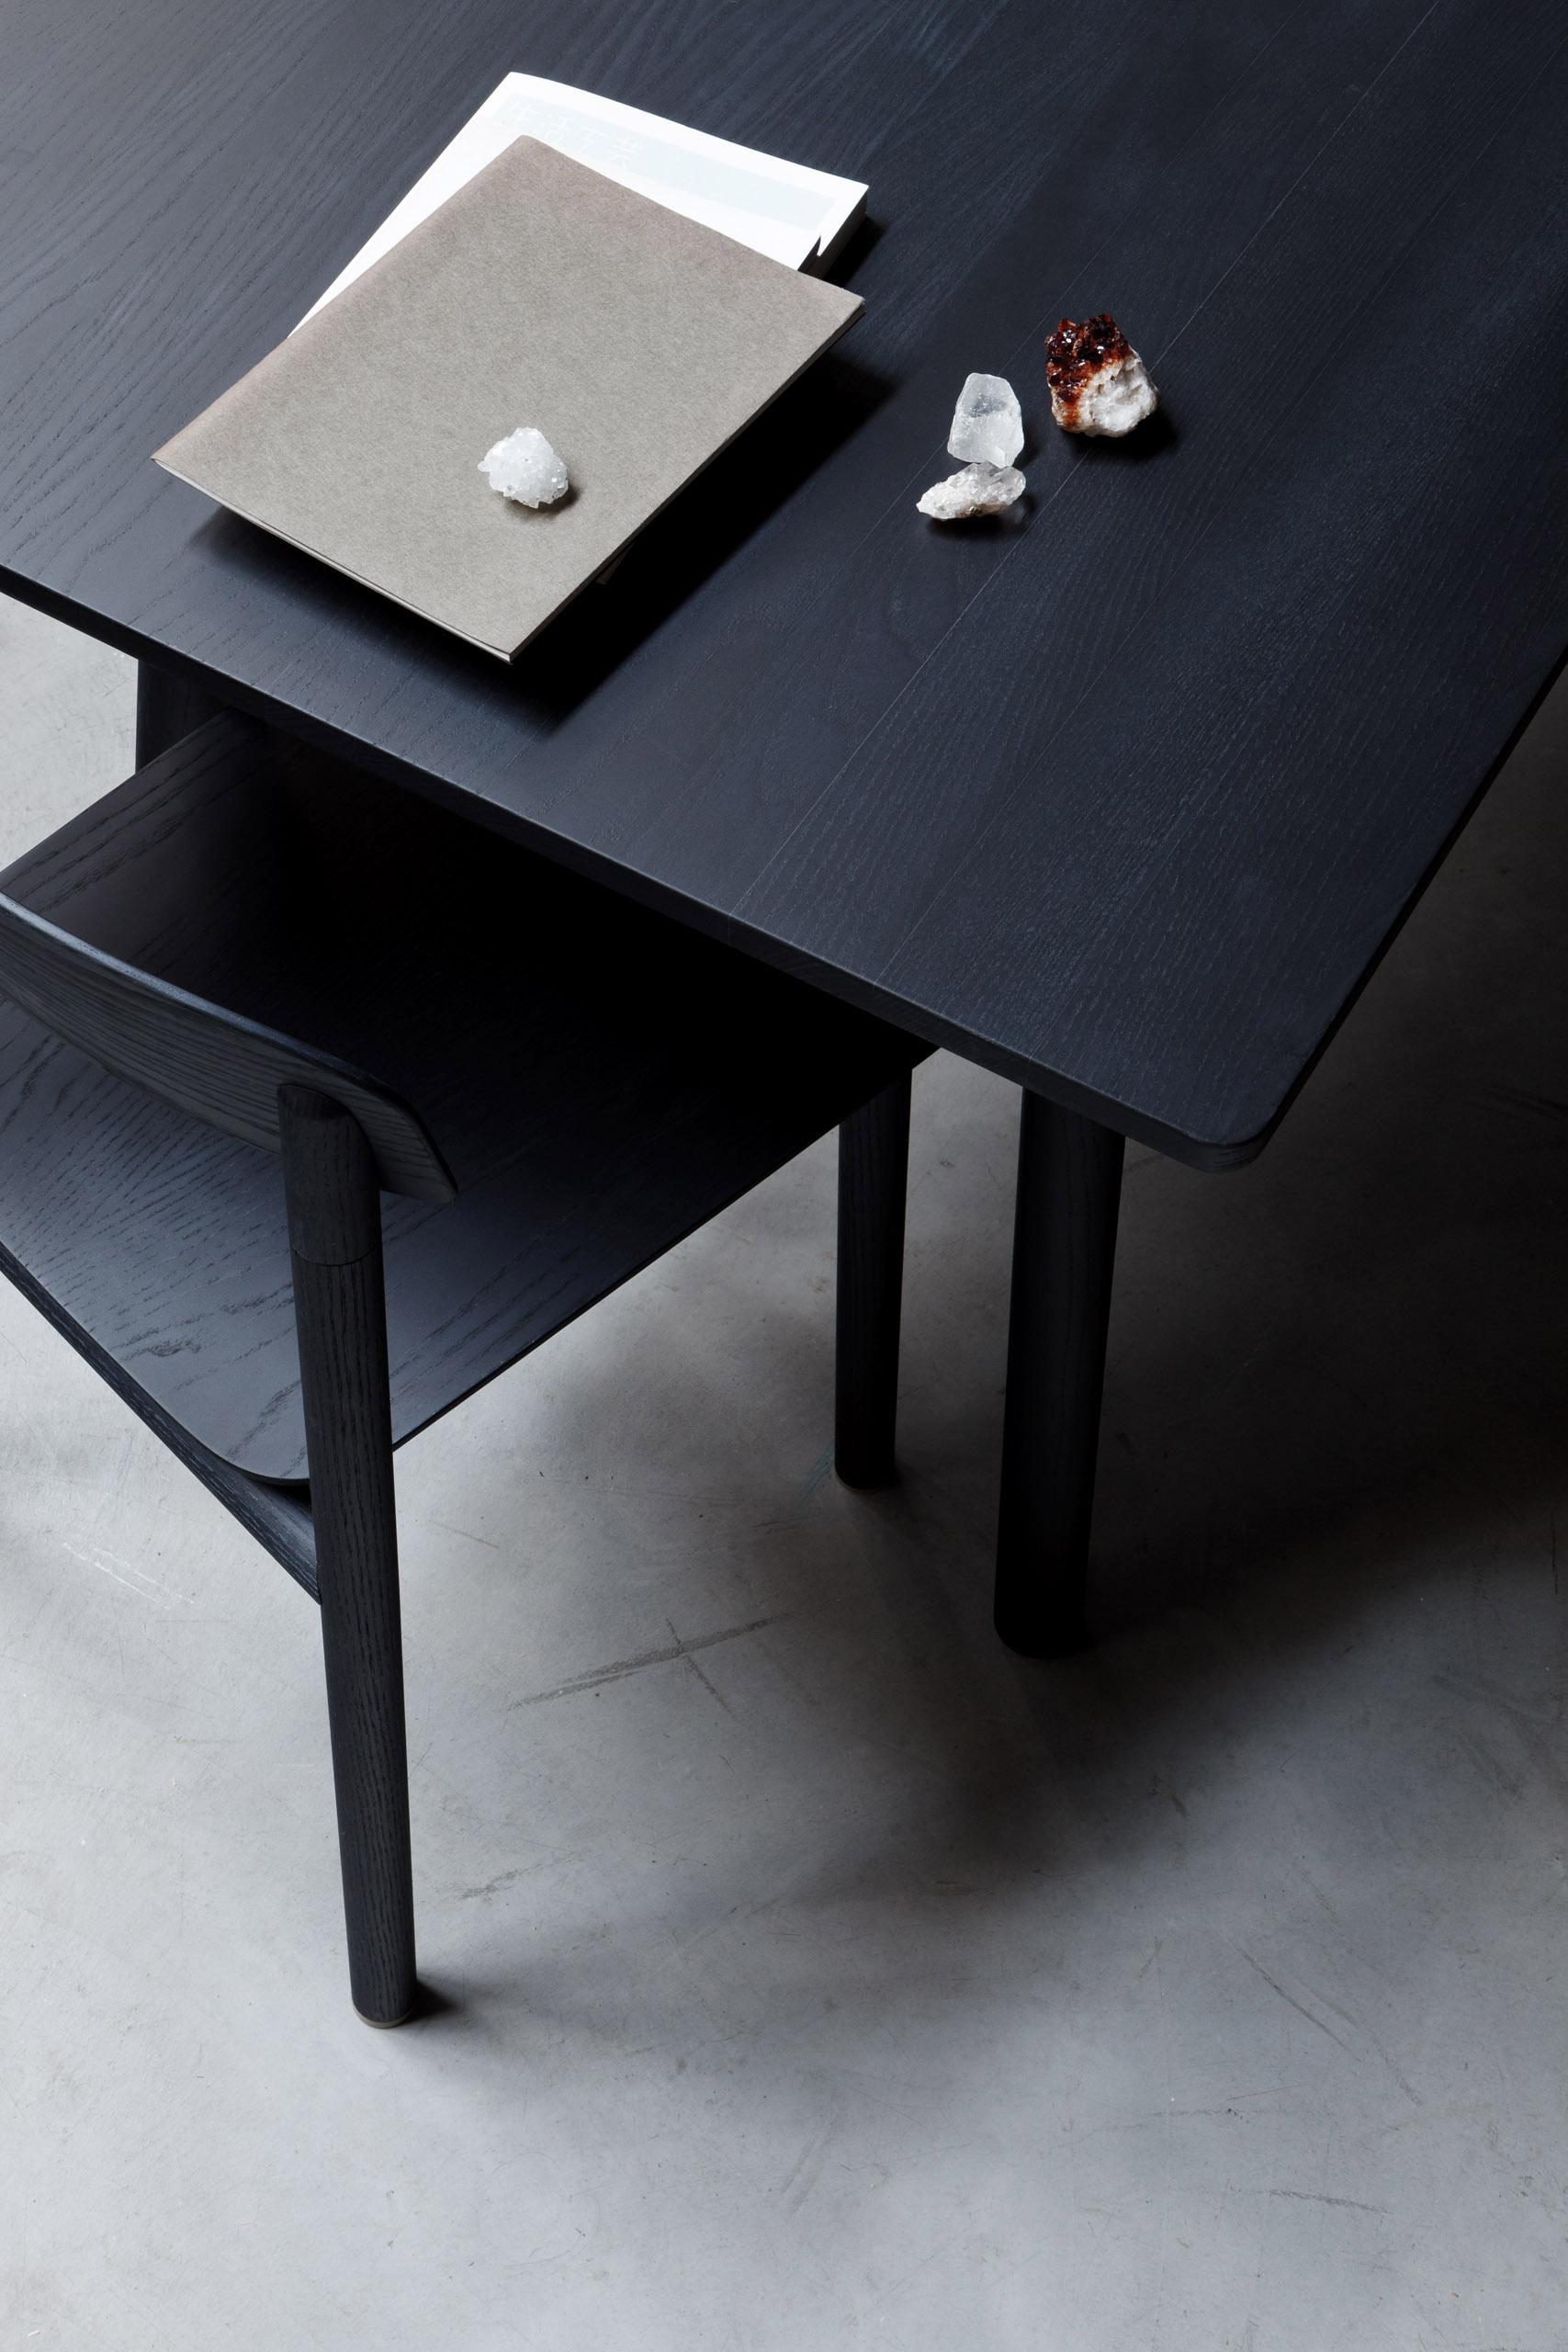 stattmann neue moebel cate st hill. Black Bedroom Furniture Sets. Home Design Ideas